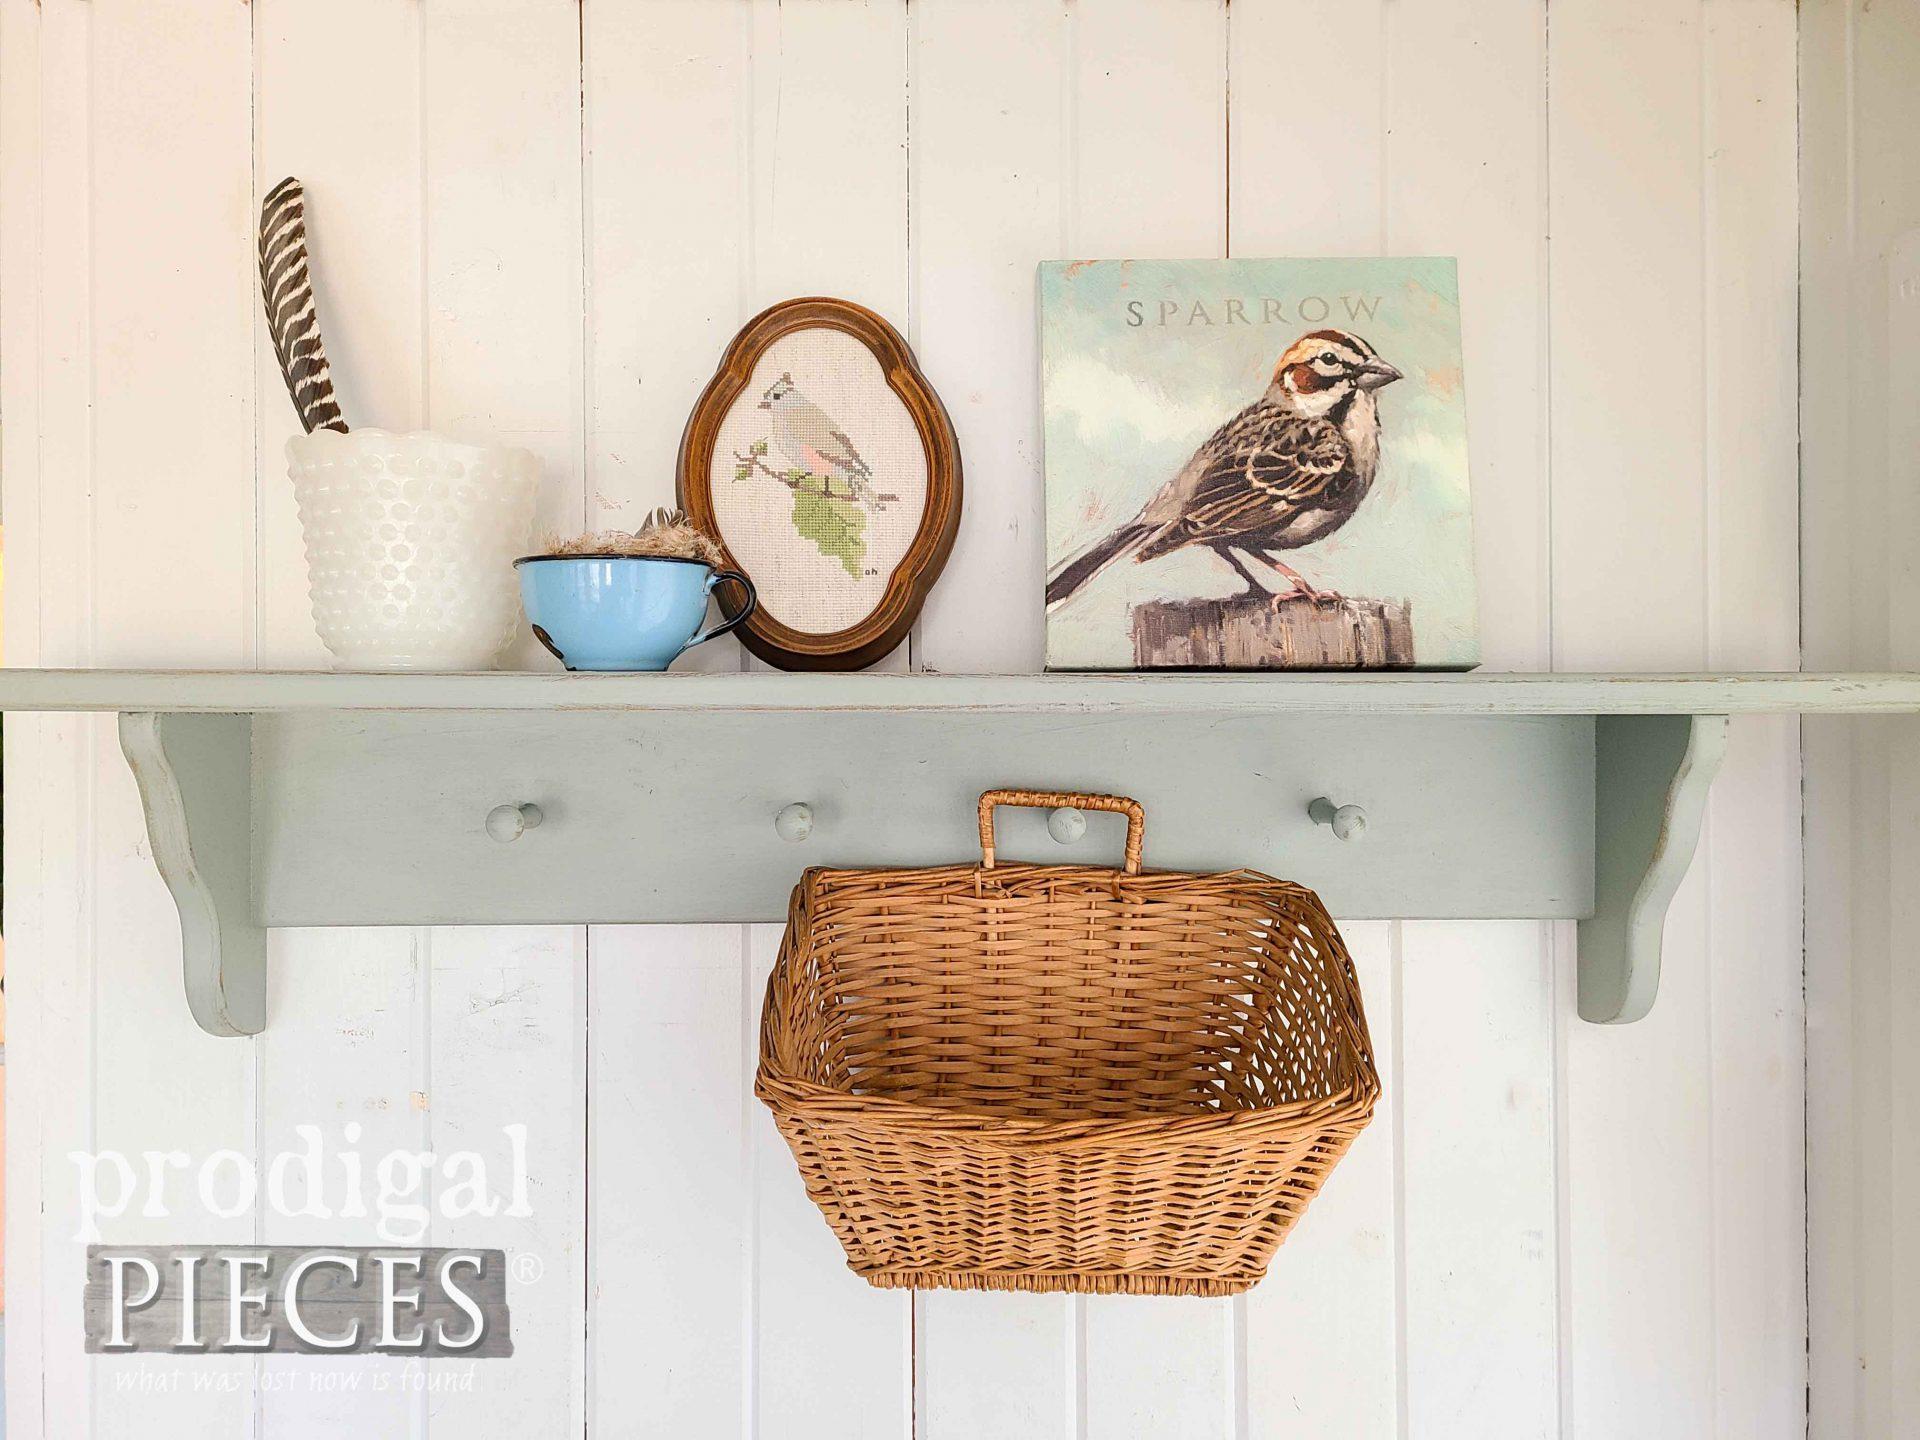 Upcycled Vintage Peg Shelf by Larissa of Prodigal Pieces | prodigalpieces.com #prodigalpieces #vintage #farmhouse #home #homedecor